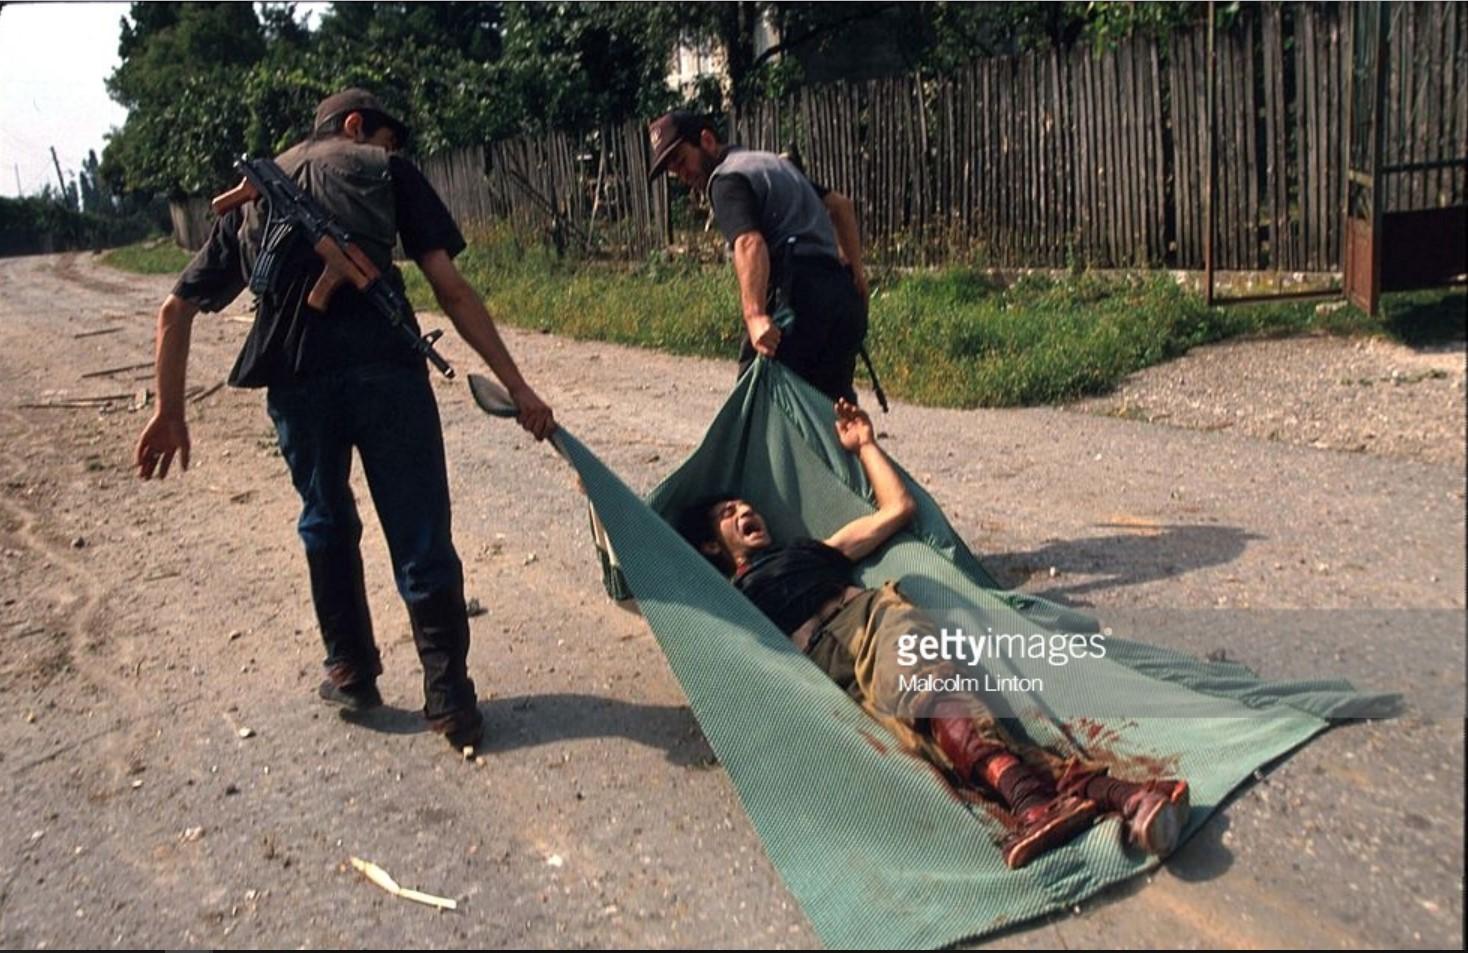 1993. 28 сентября. Сухуми. Два грузинских солдата тащат раненого товарища на одеялегода в Сухуми